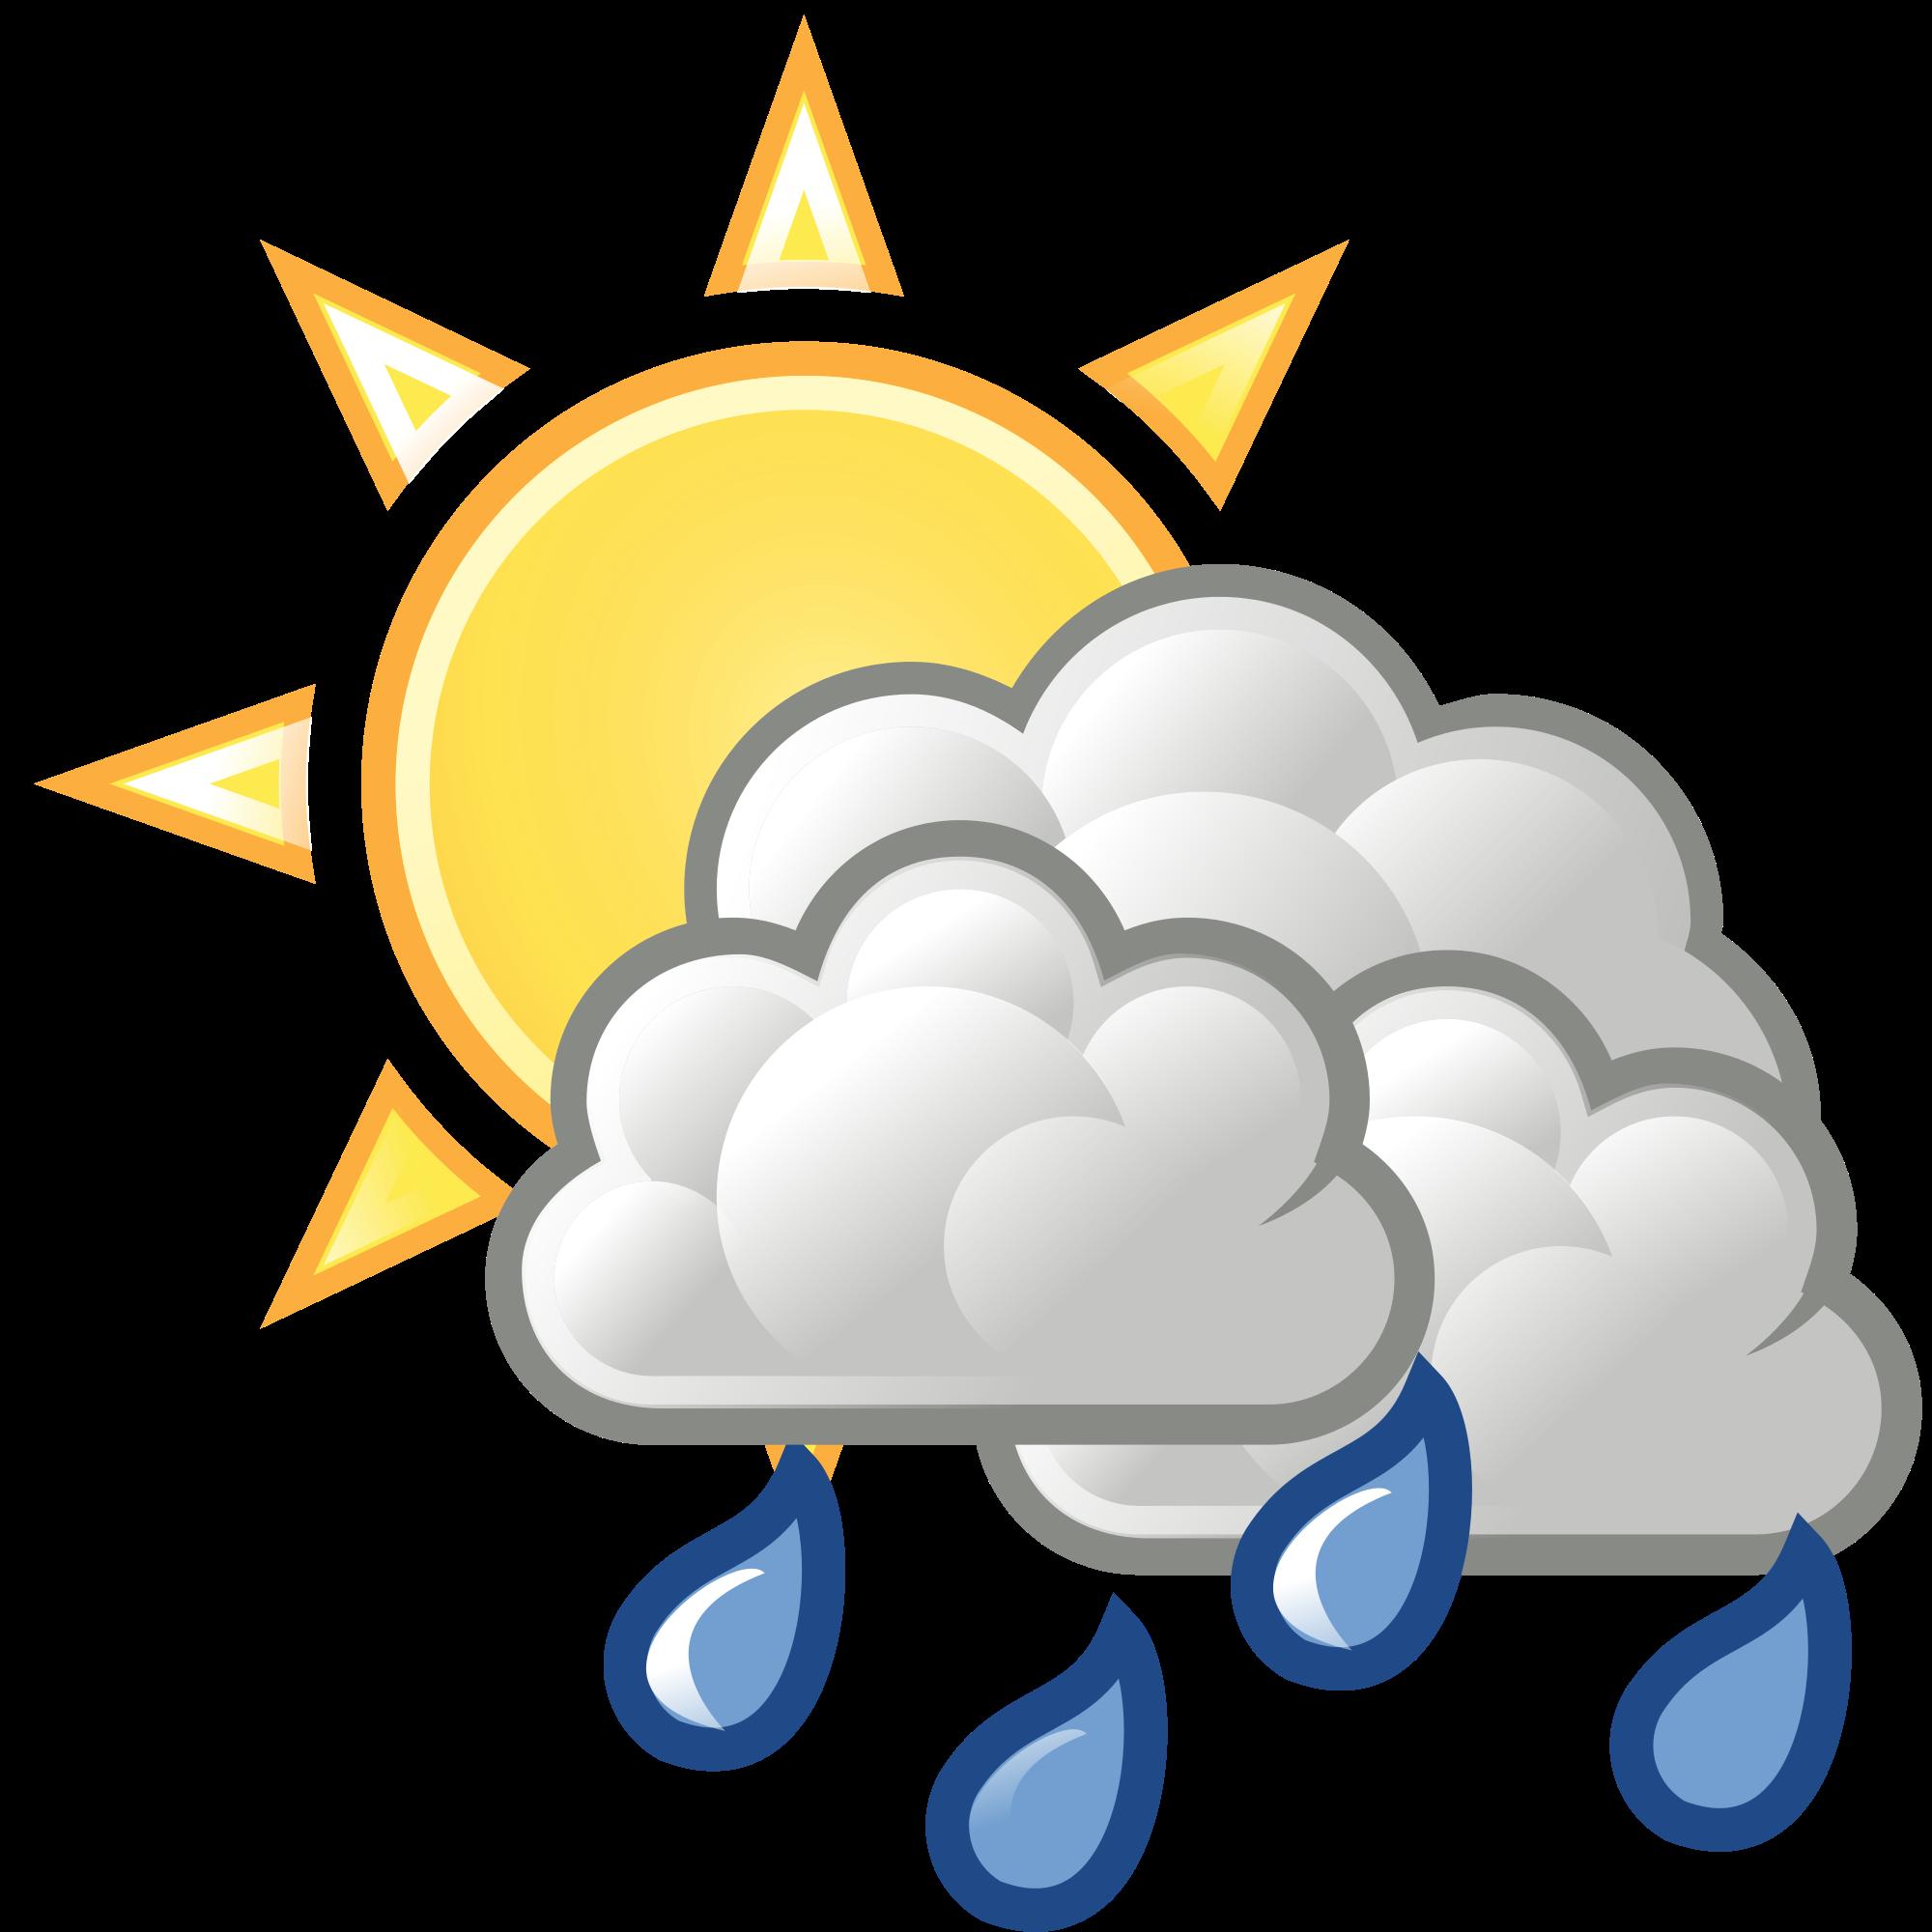 Clipart rain sun. And png transparent images